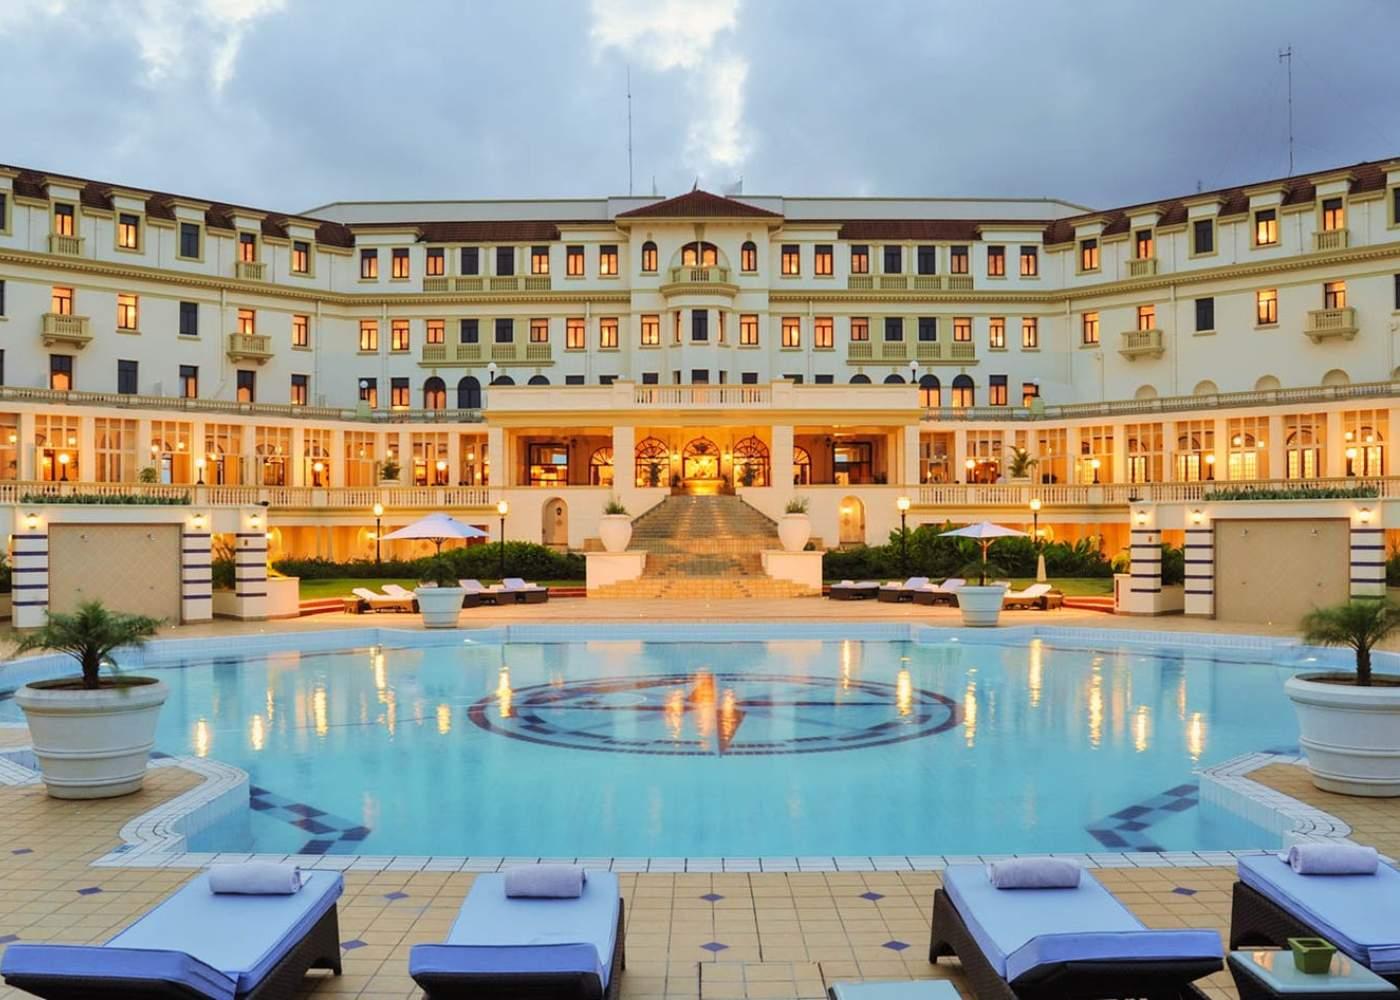 Hotel Polana em Maputo